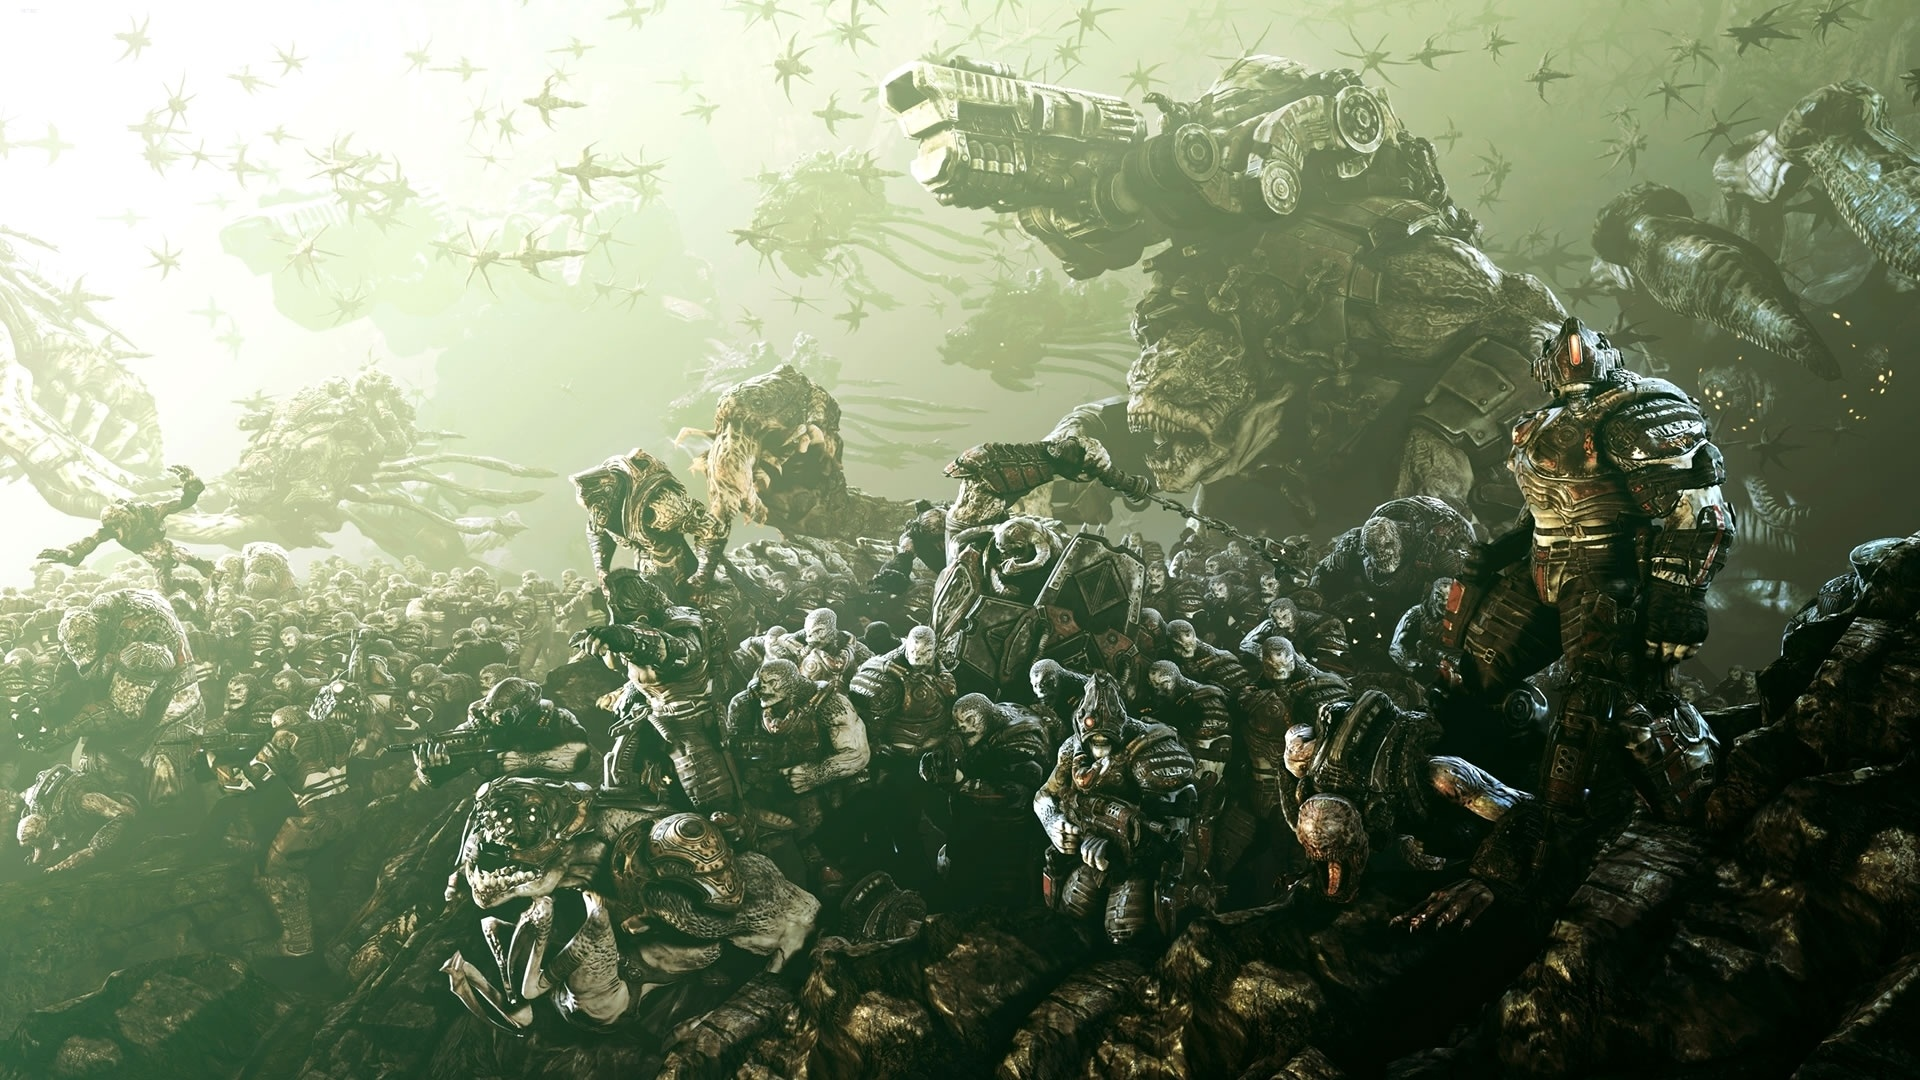 Gears Of War desktop wallpaper free download